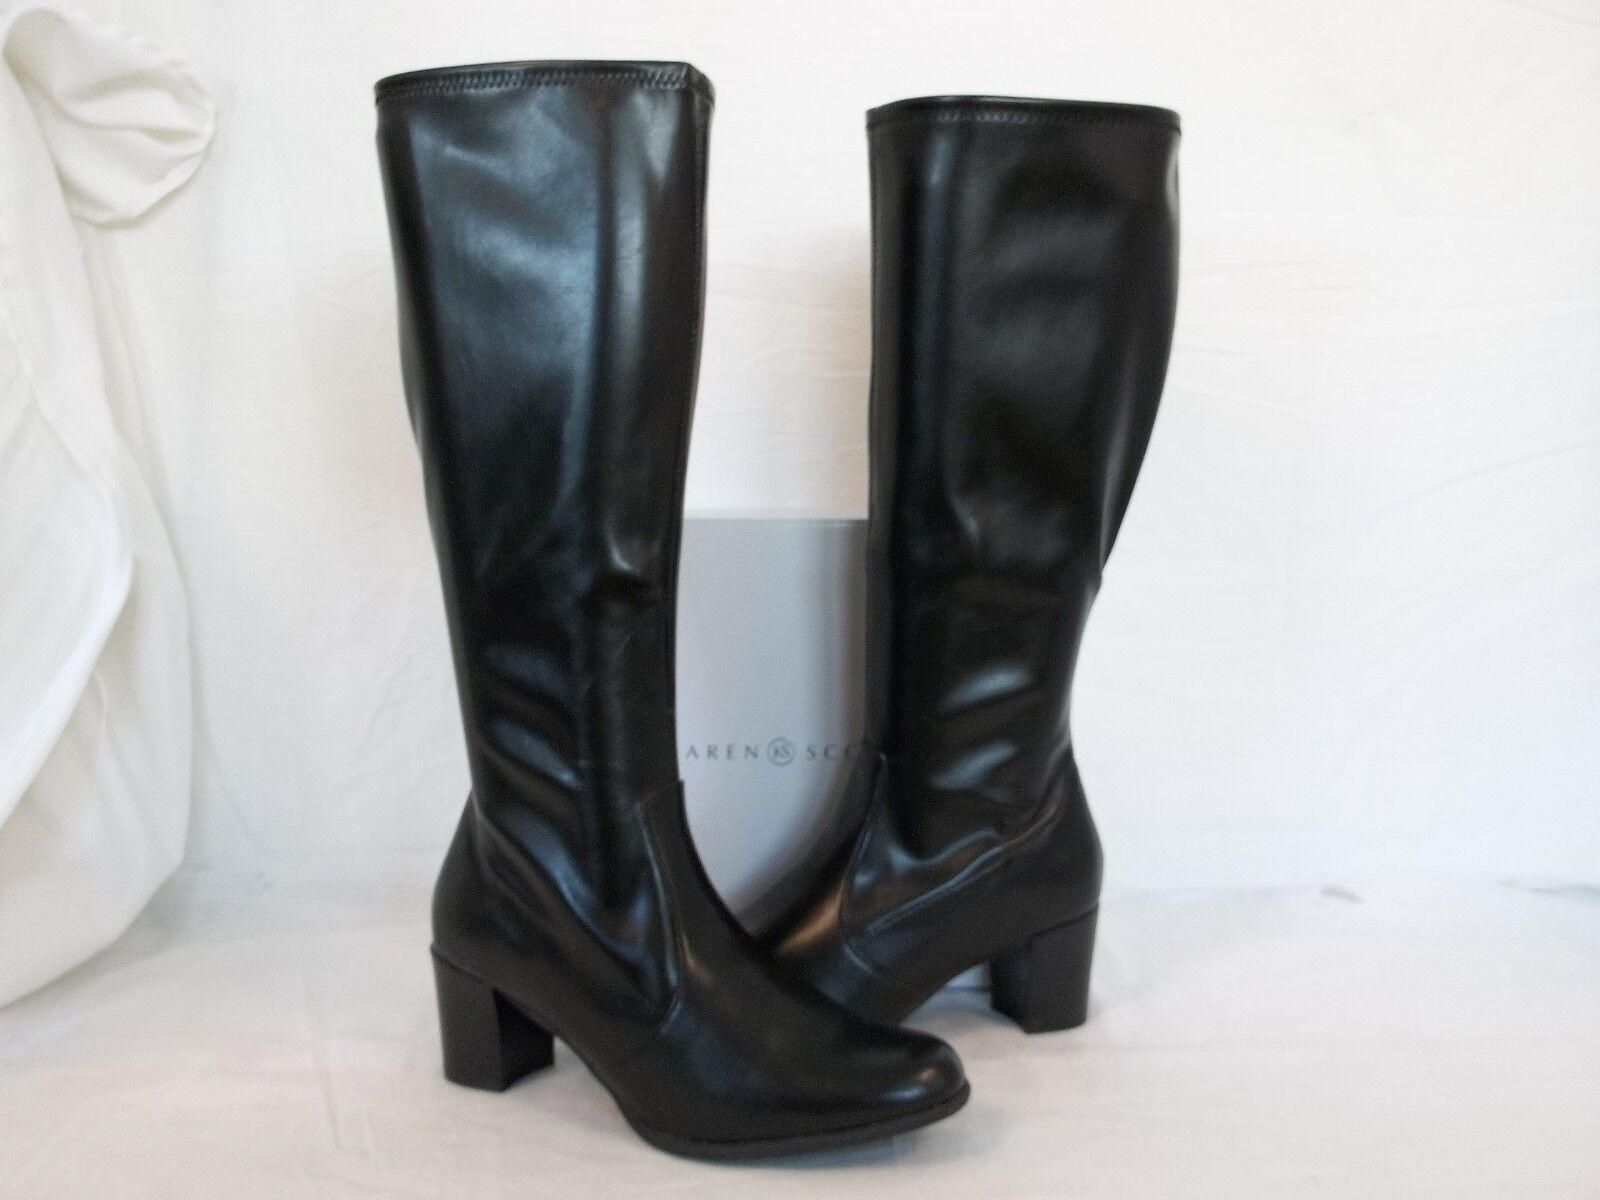 Karen Scott Size 6.5 M Lucca Black Knee High Boots New Womens Shoes